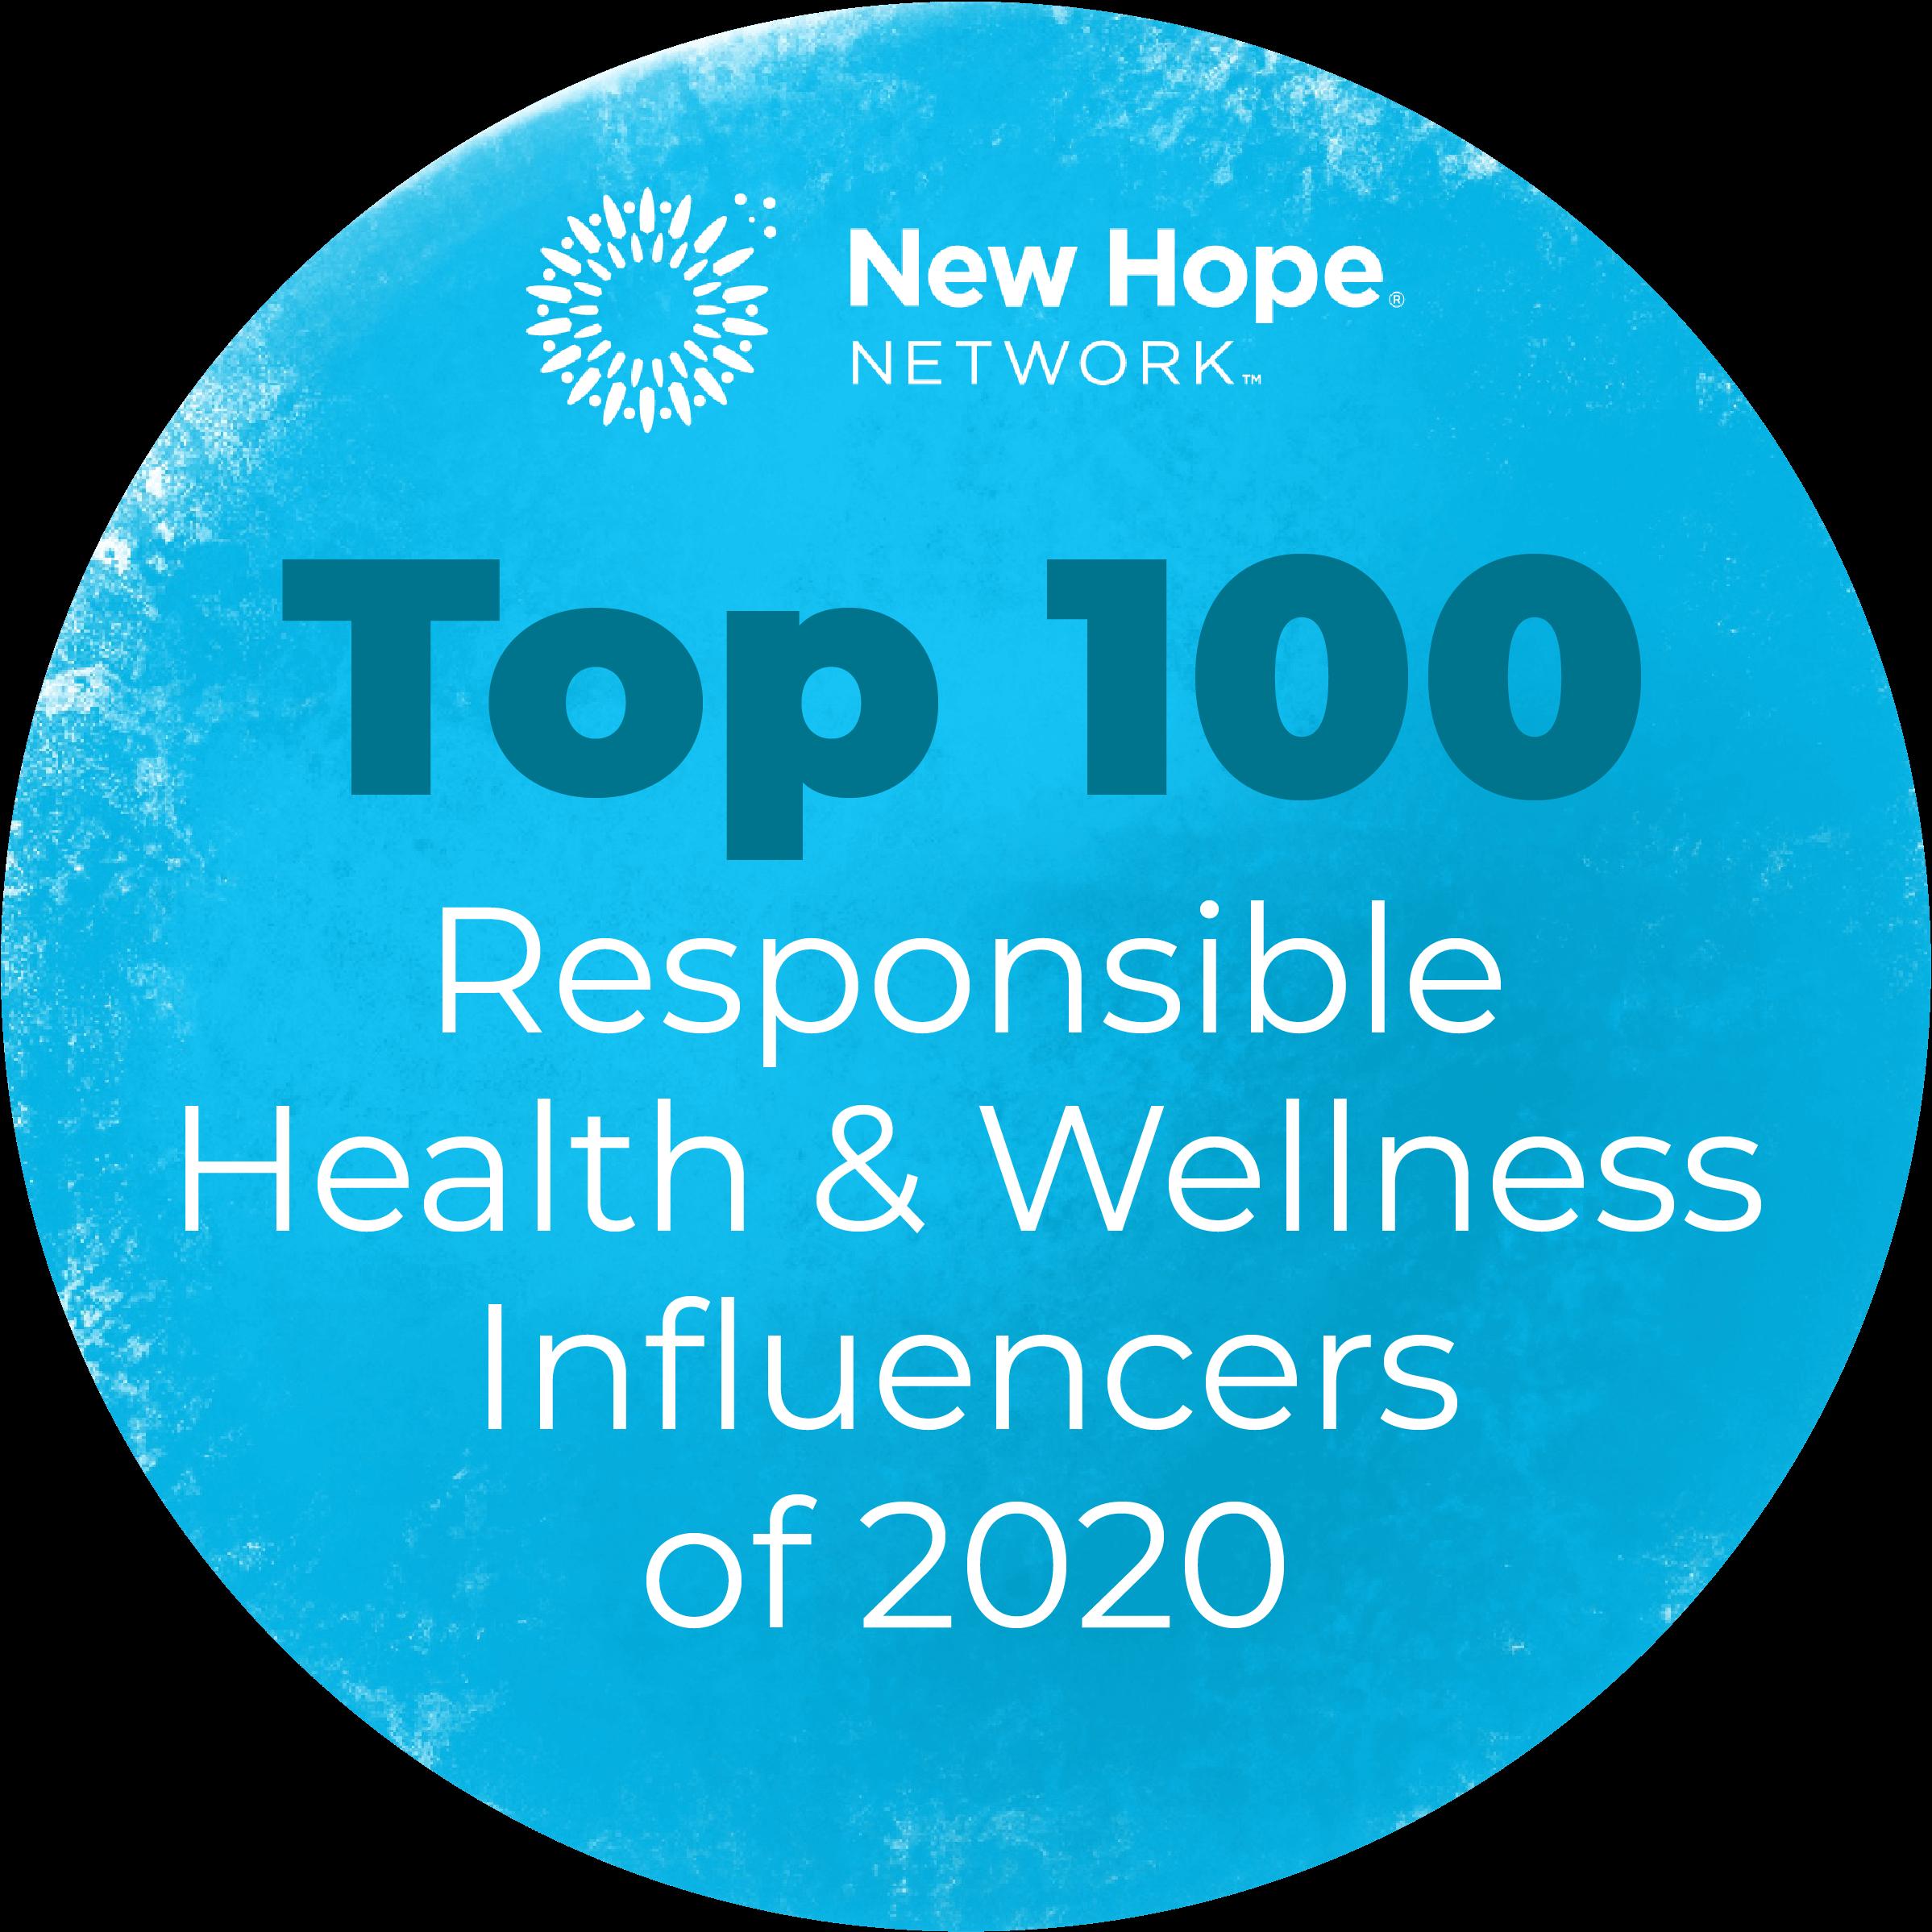 Top 100 Responsible Health & Wellness Influencers of 2020 agutsygirl.com A Gutsy Girl gut health healing